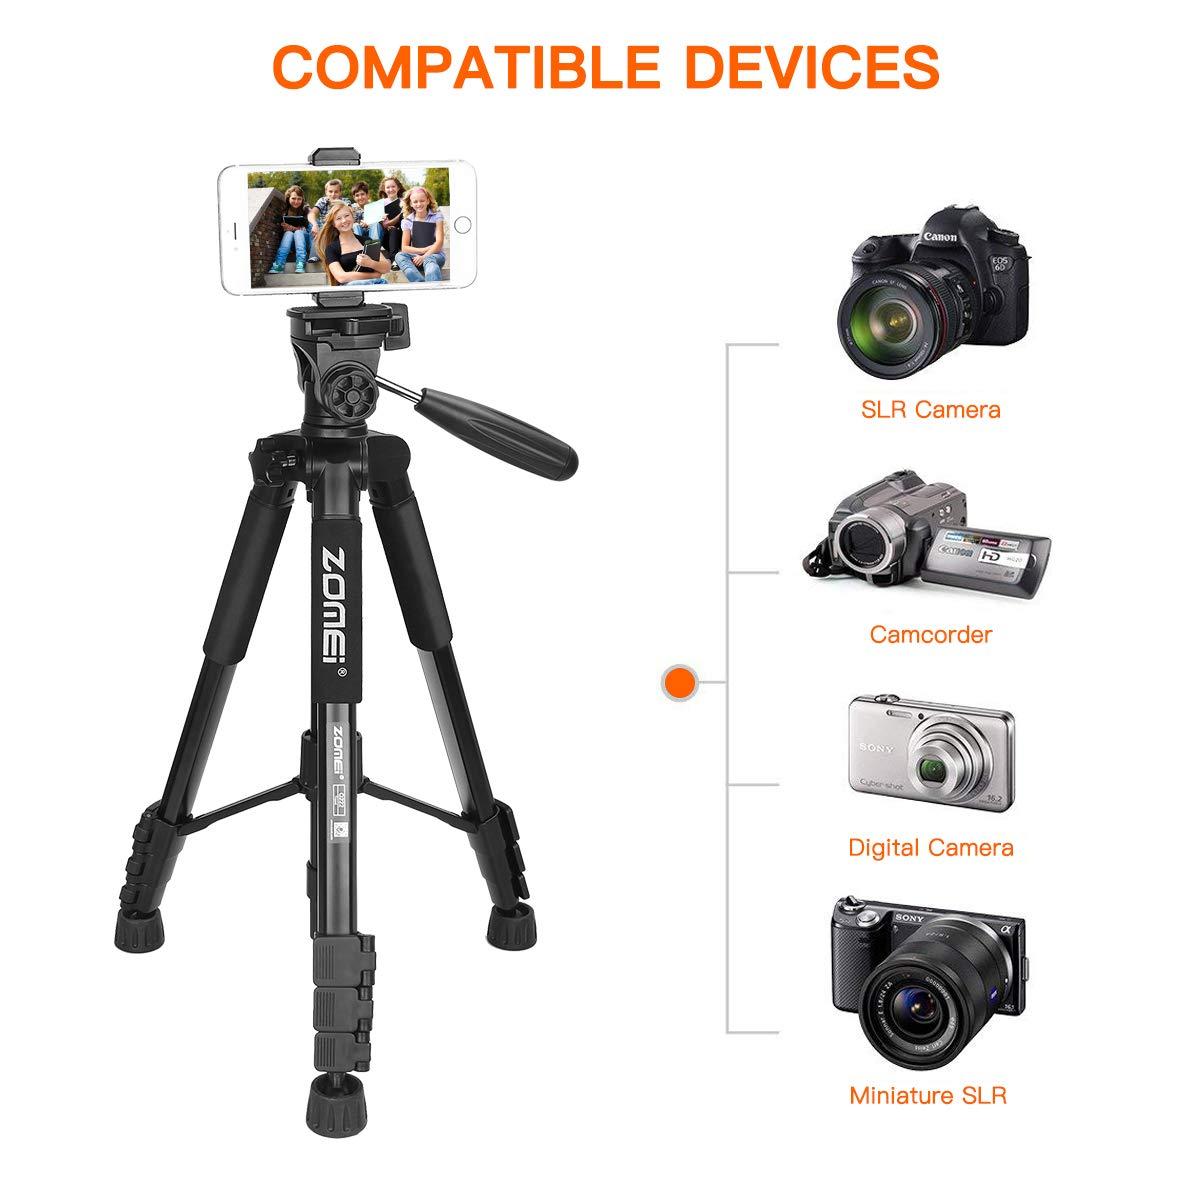 ZOMEi Travel Tripod 2-in-1 Aluminum Alloy Camera Tripod Portable Monopod for DSLR Canon Nikon Sony SLR, Phone Video and DV Video Camcorder